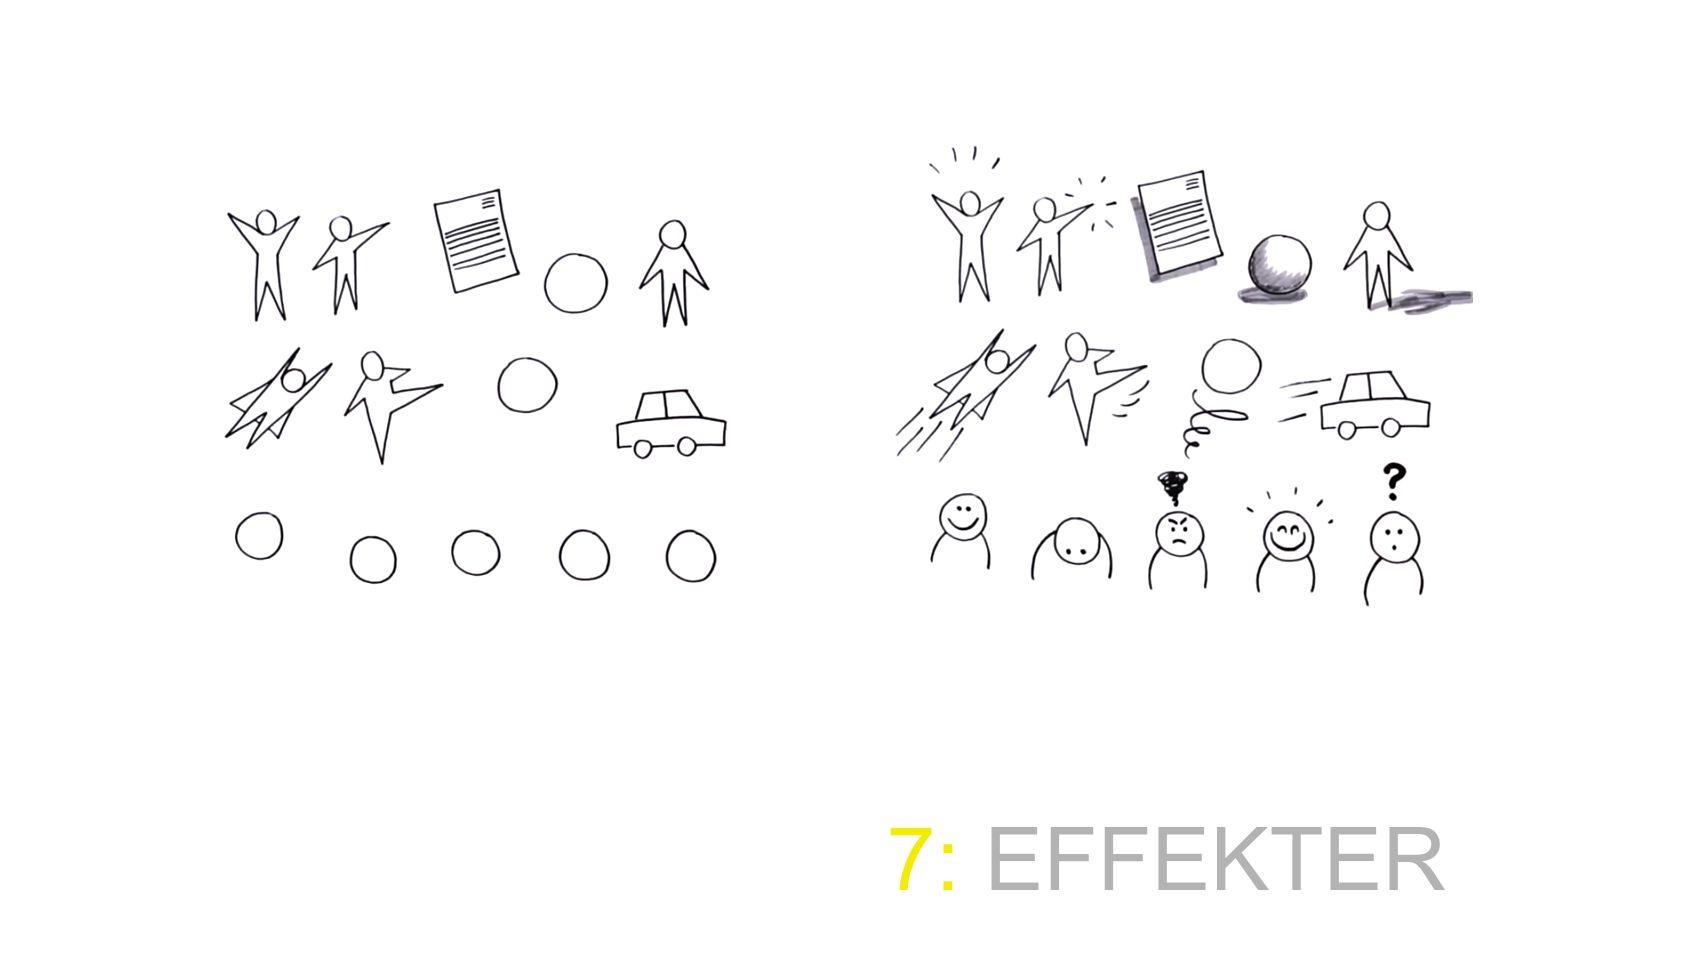 7: EFFEKTER